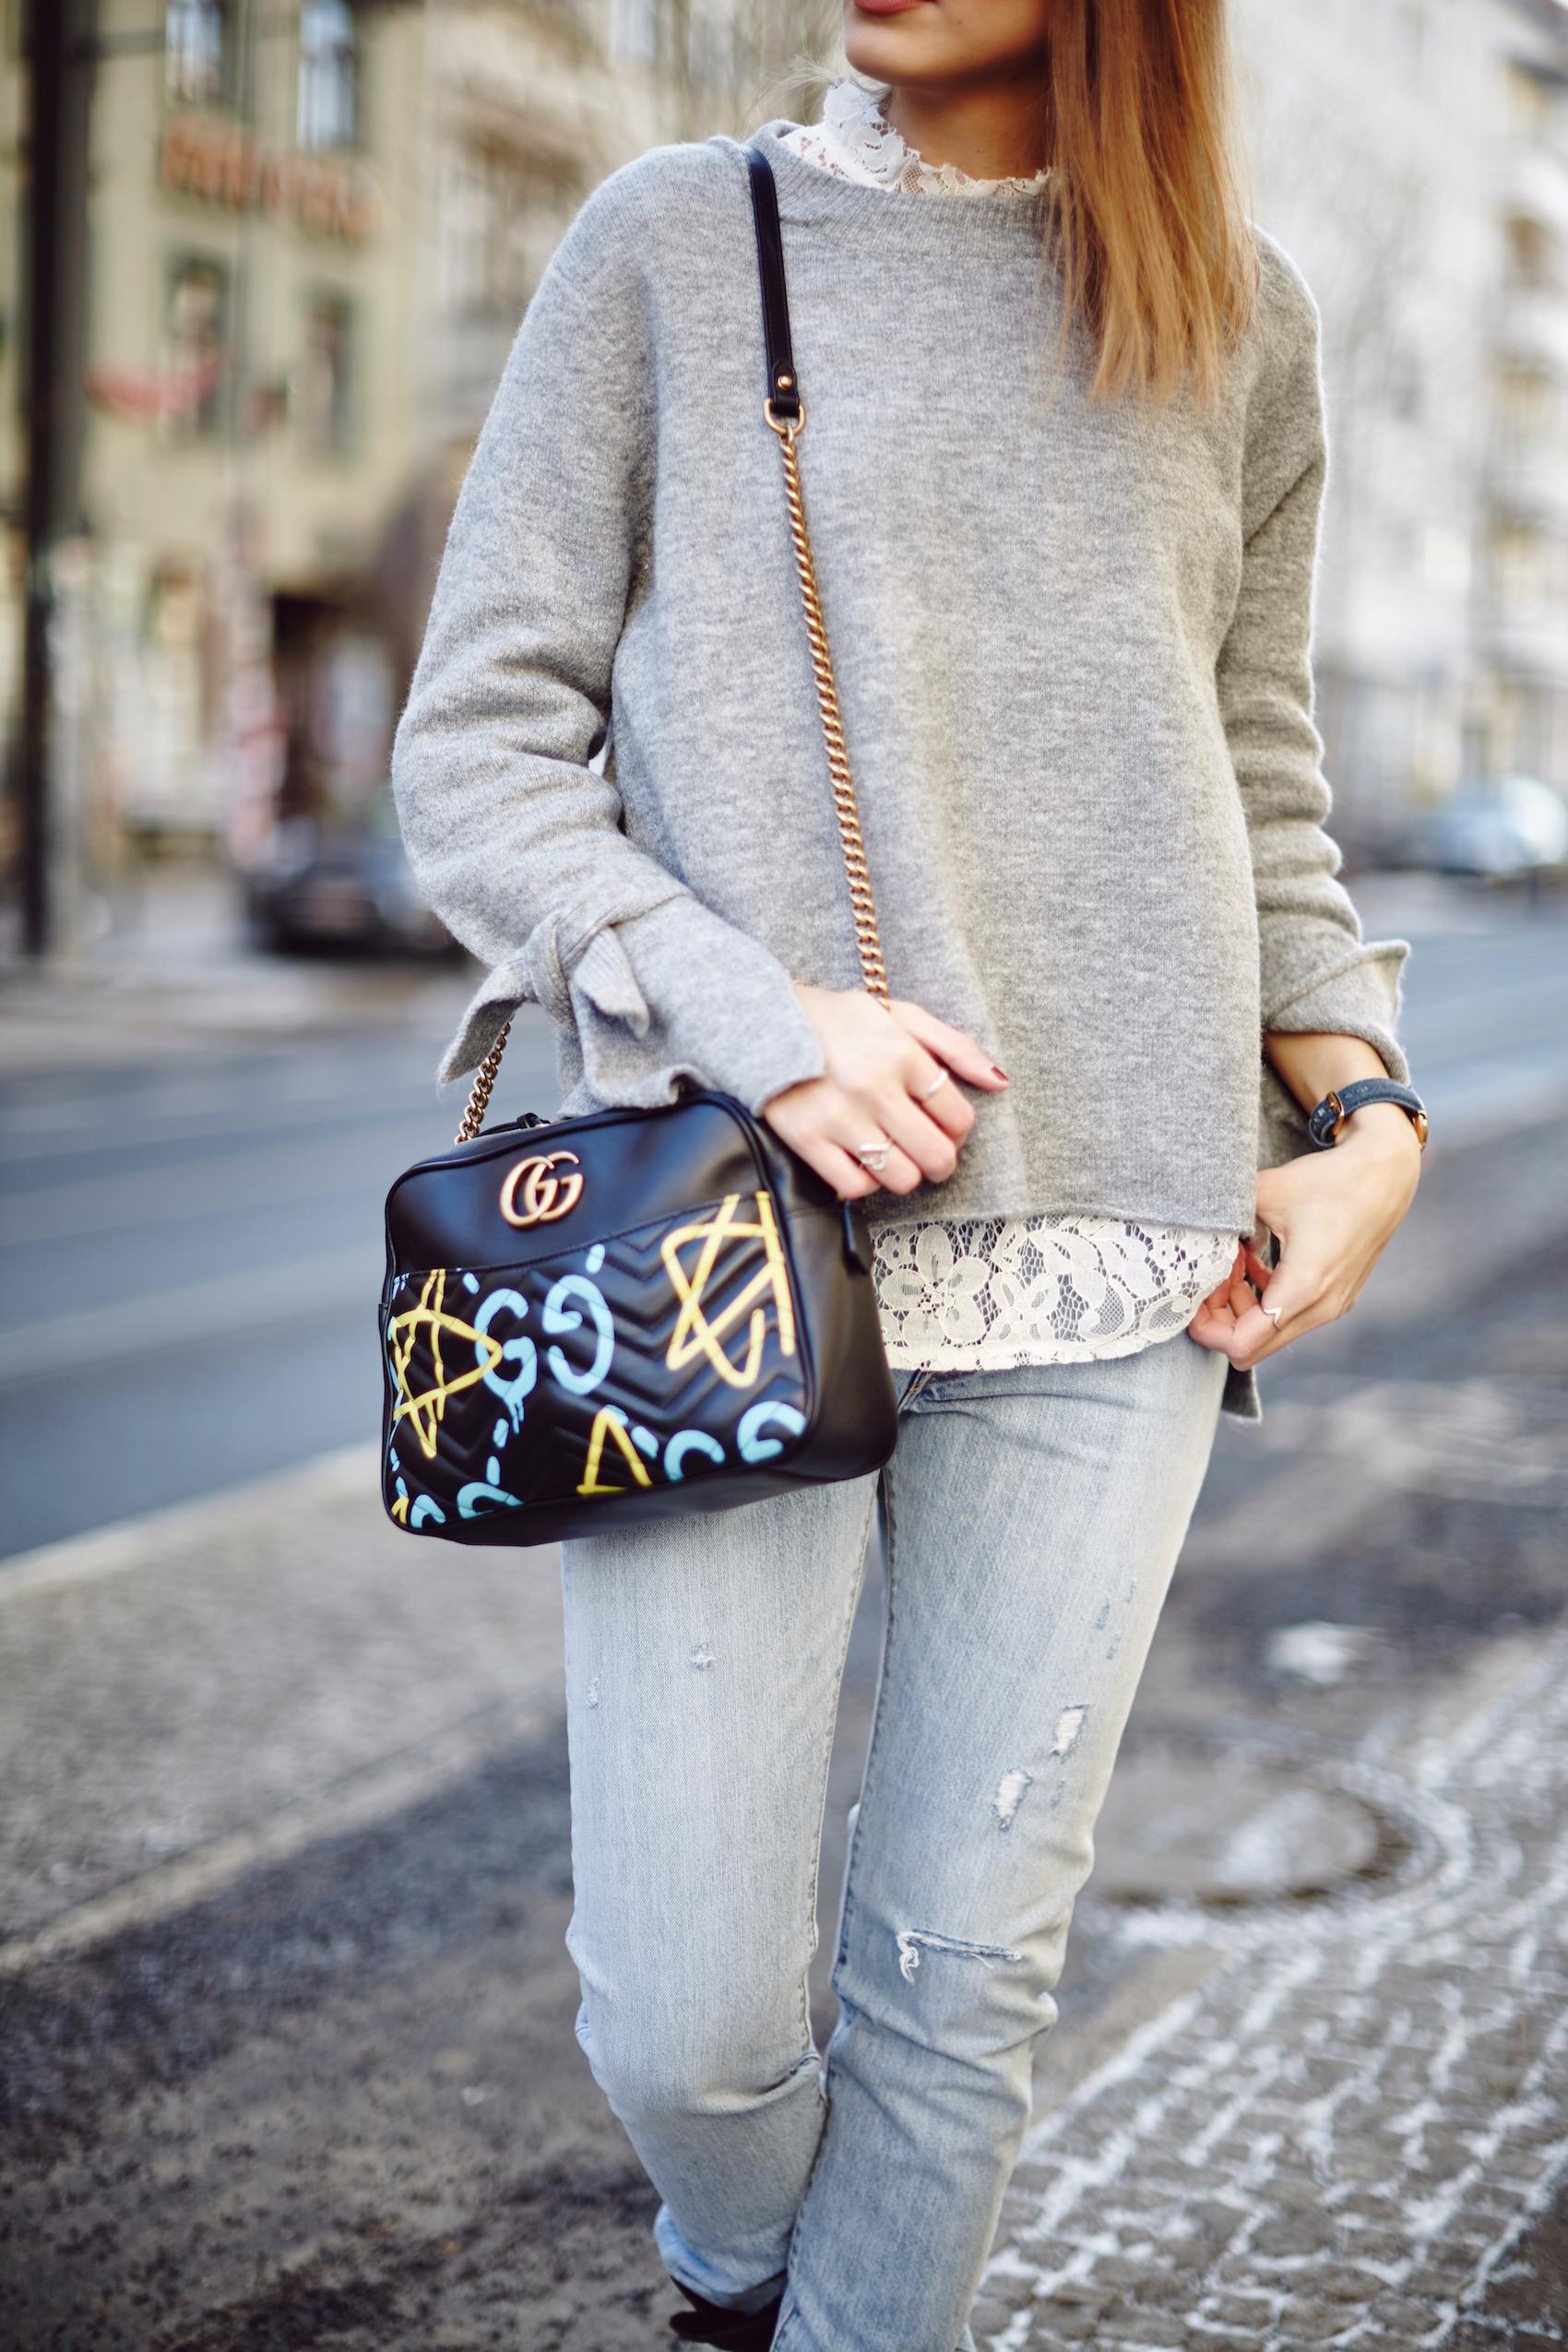 sue_loves_nyc_fashion_week_berlin_gucci_ghost_closed_mantel_Levi's_501_Skinny_SuelovesNYC_Susan_Fengler_04